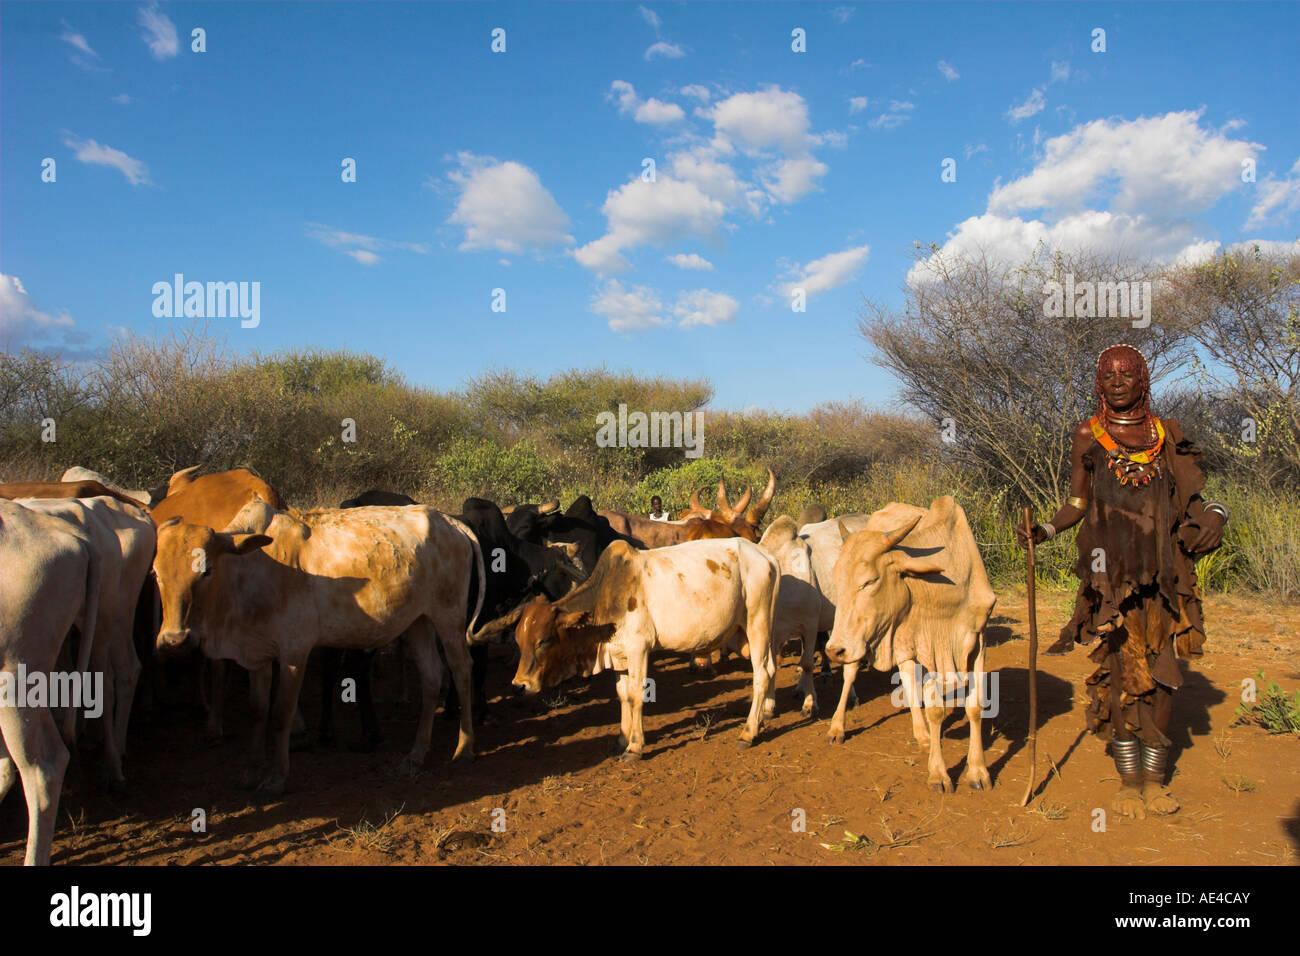 Ritual dancing, Jumping of the Bulls initiation ceremony of the Hamer (Hamar) people, Turmi, Lower Omo Valley, Ethiopia, - Stock Image